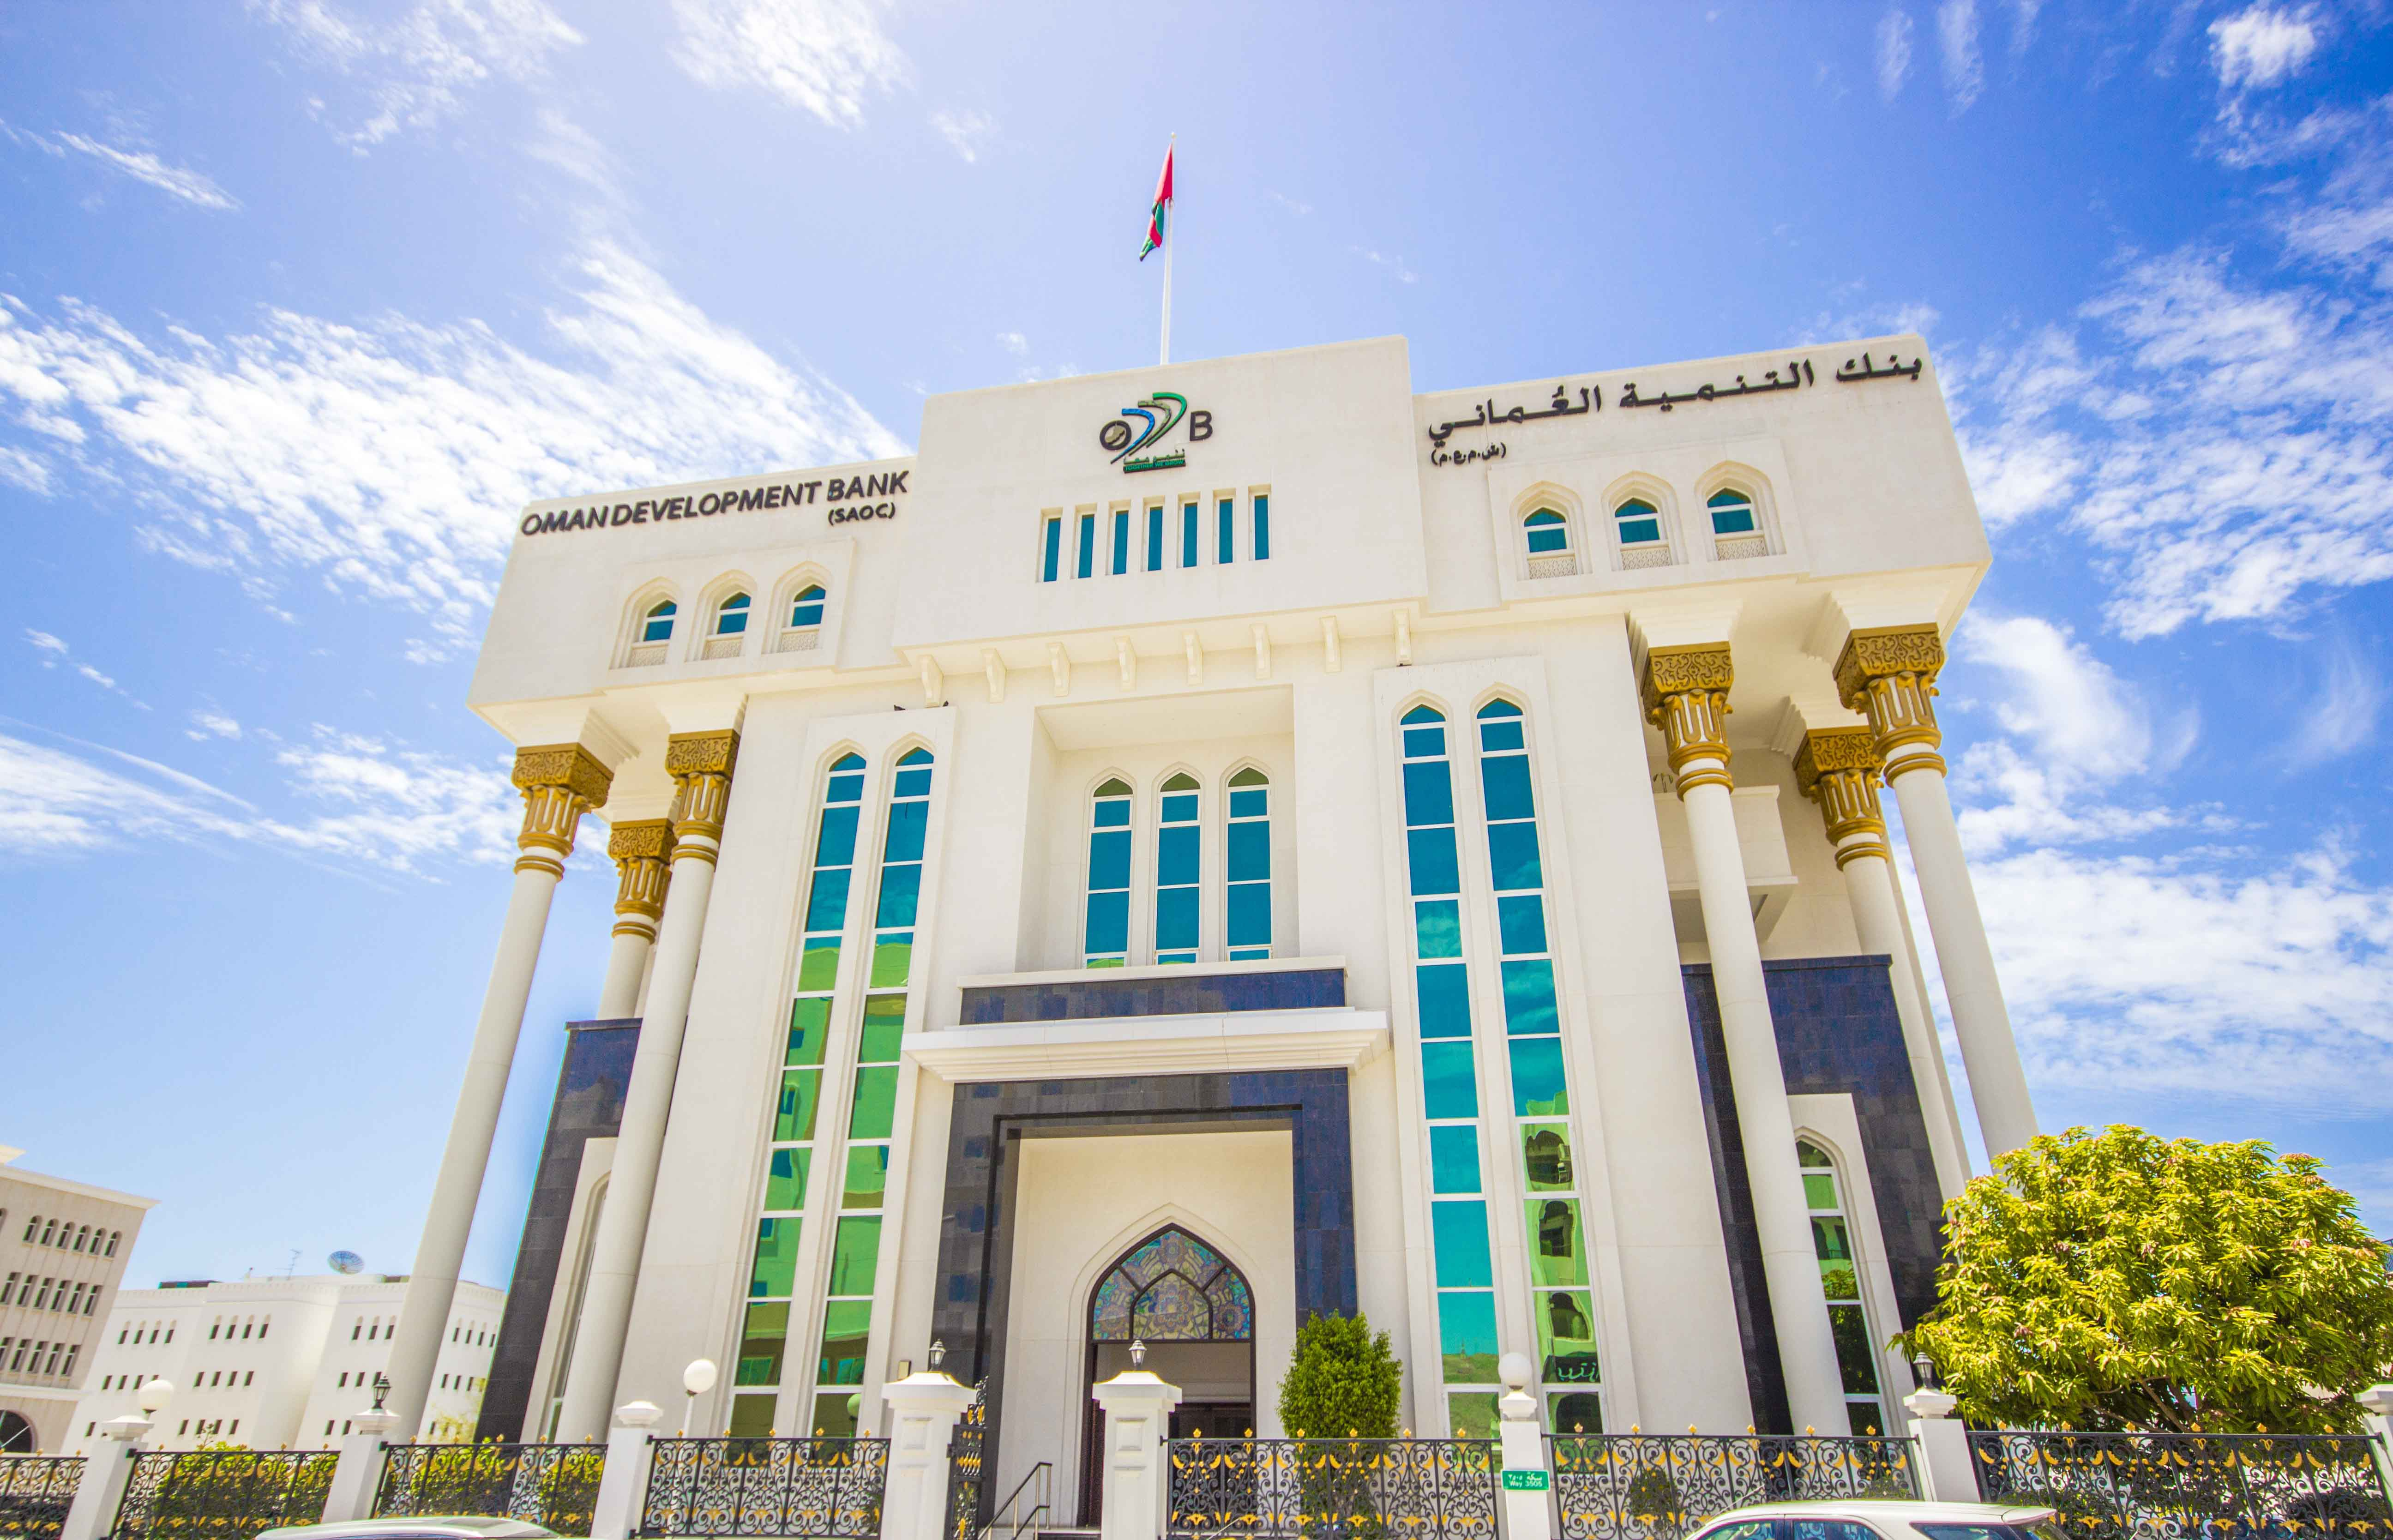 Oman Development Bank wins Best Bank Award for SME support